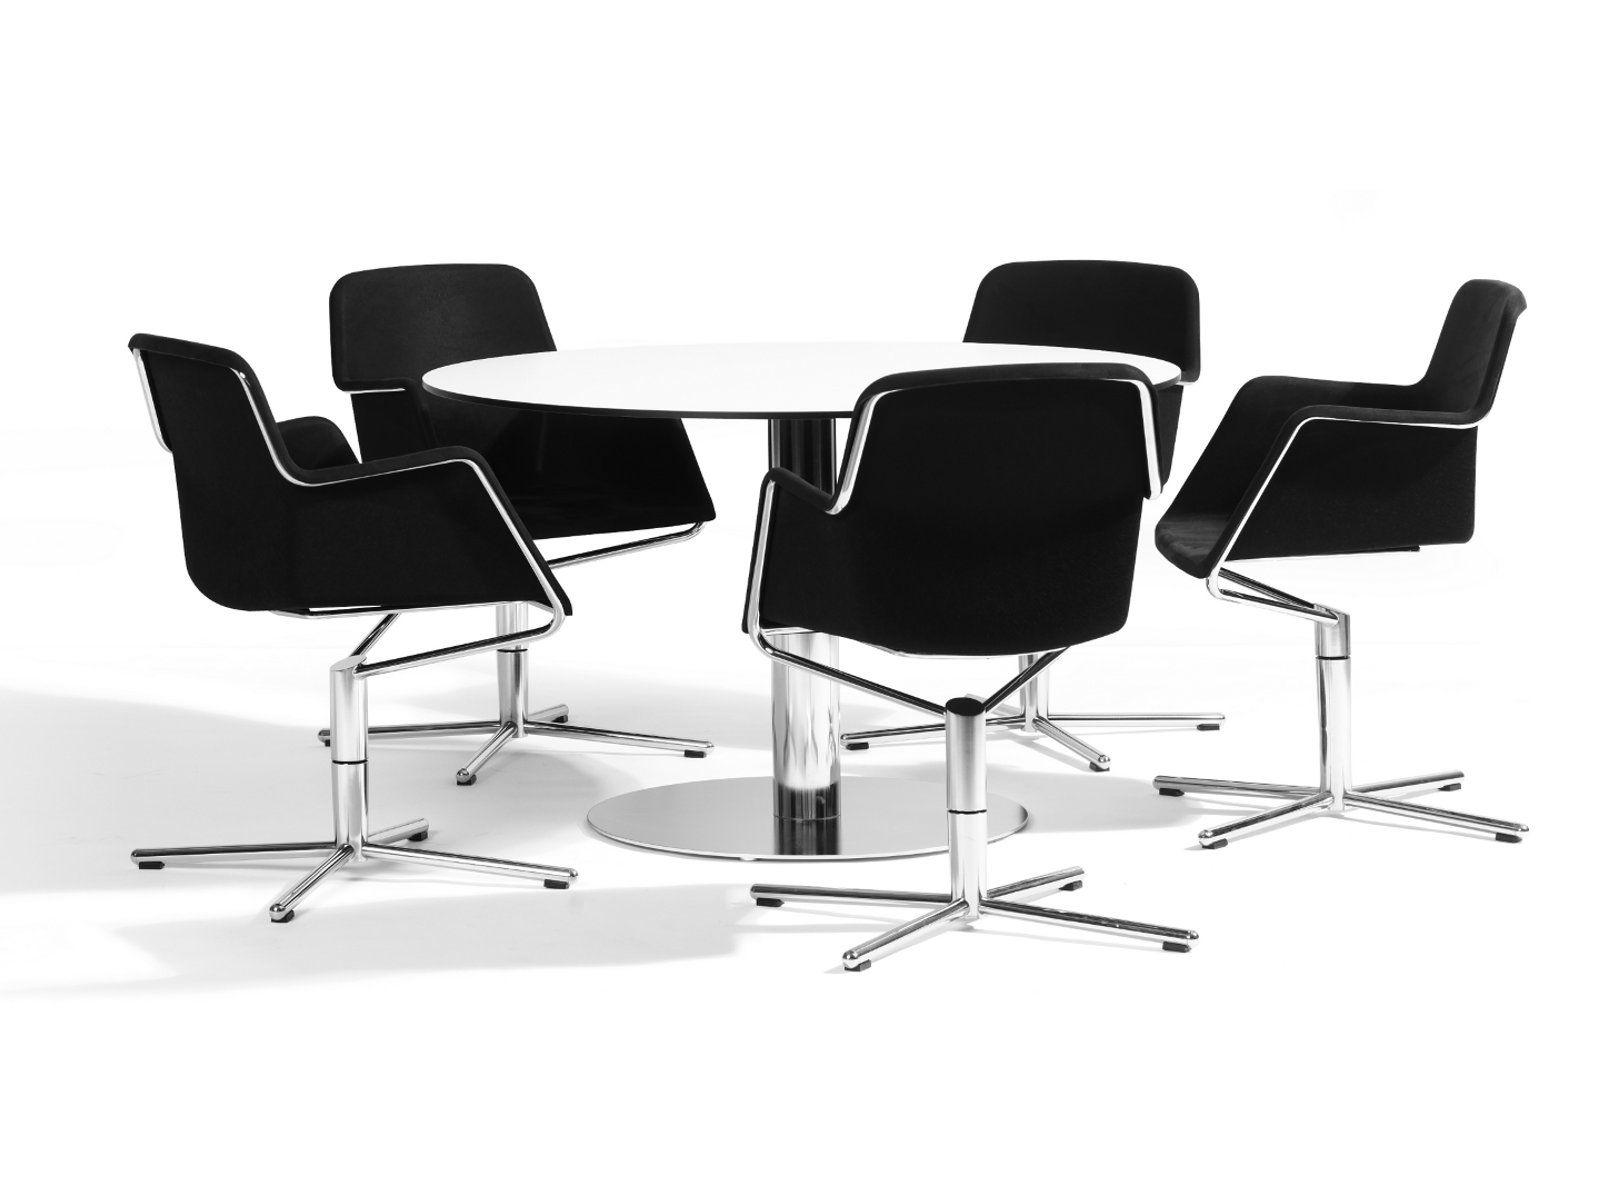 Drehbarer stuhl aus filz mit armlehnen peek kollektion for Design stuhl filz